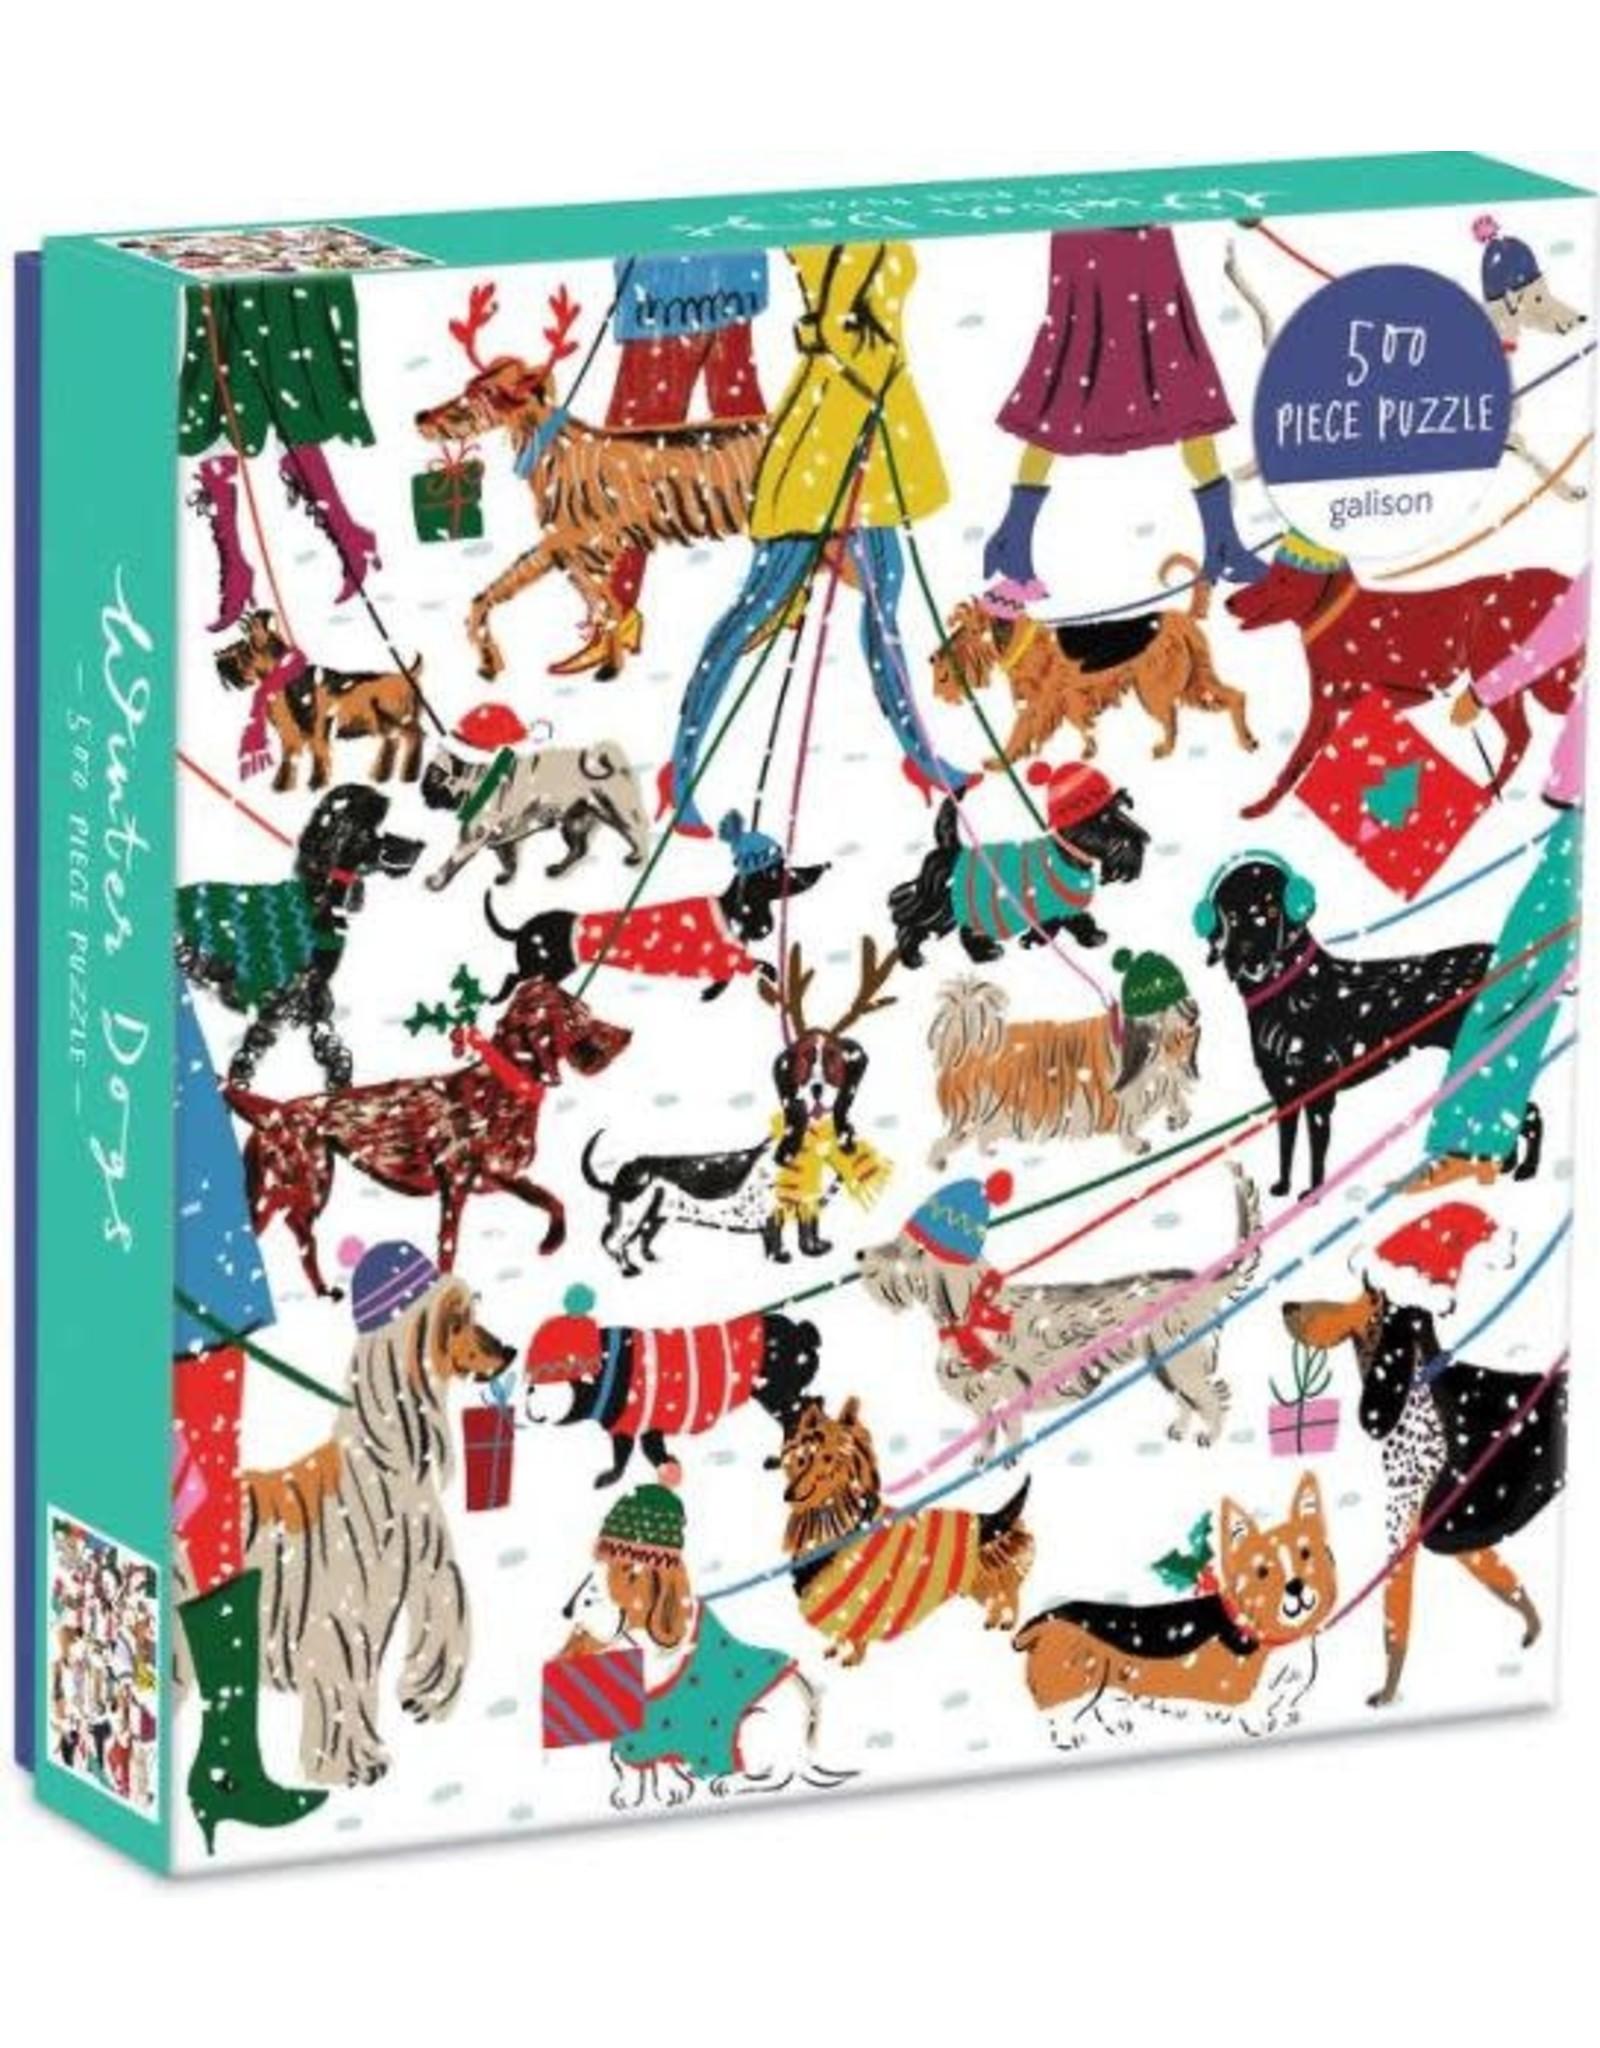 Galison Winter Dogs 500 Piece Puzzle